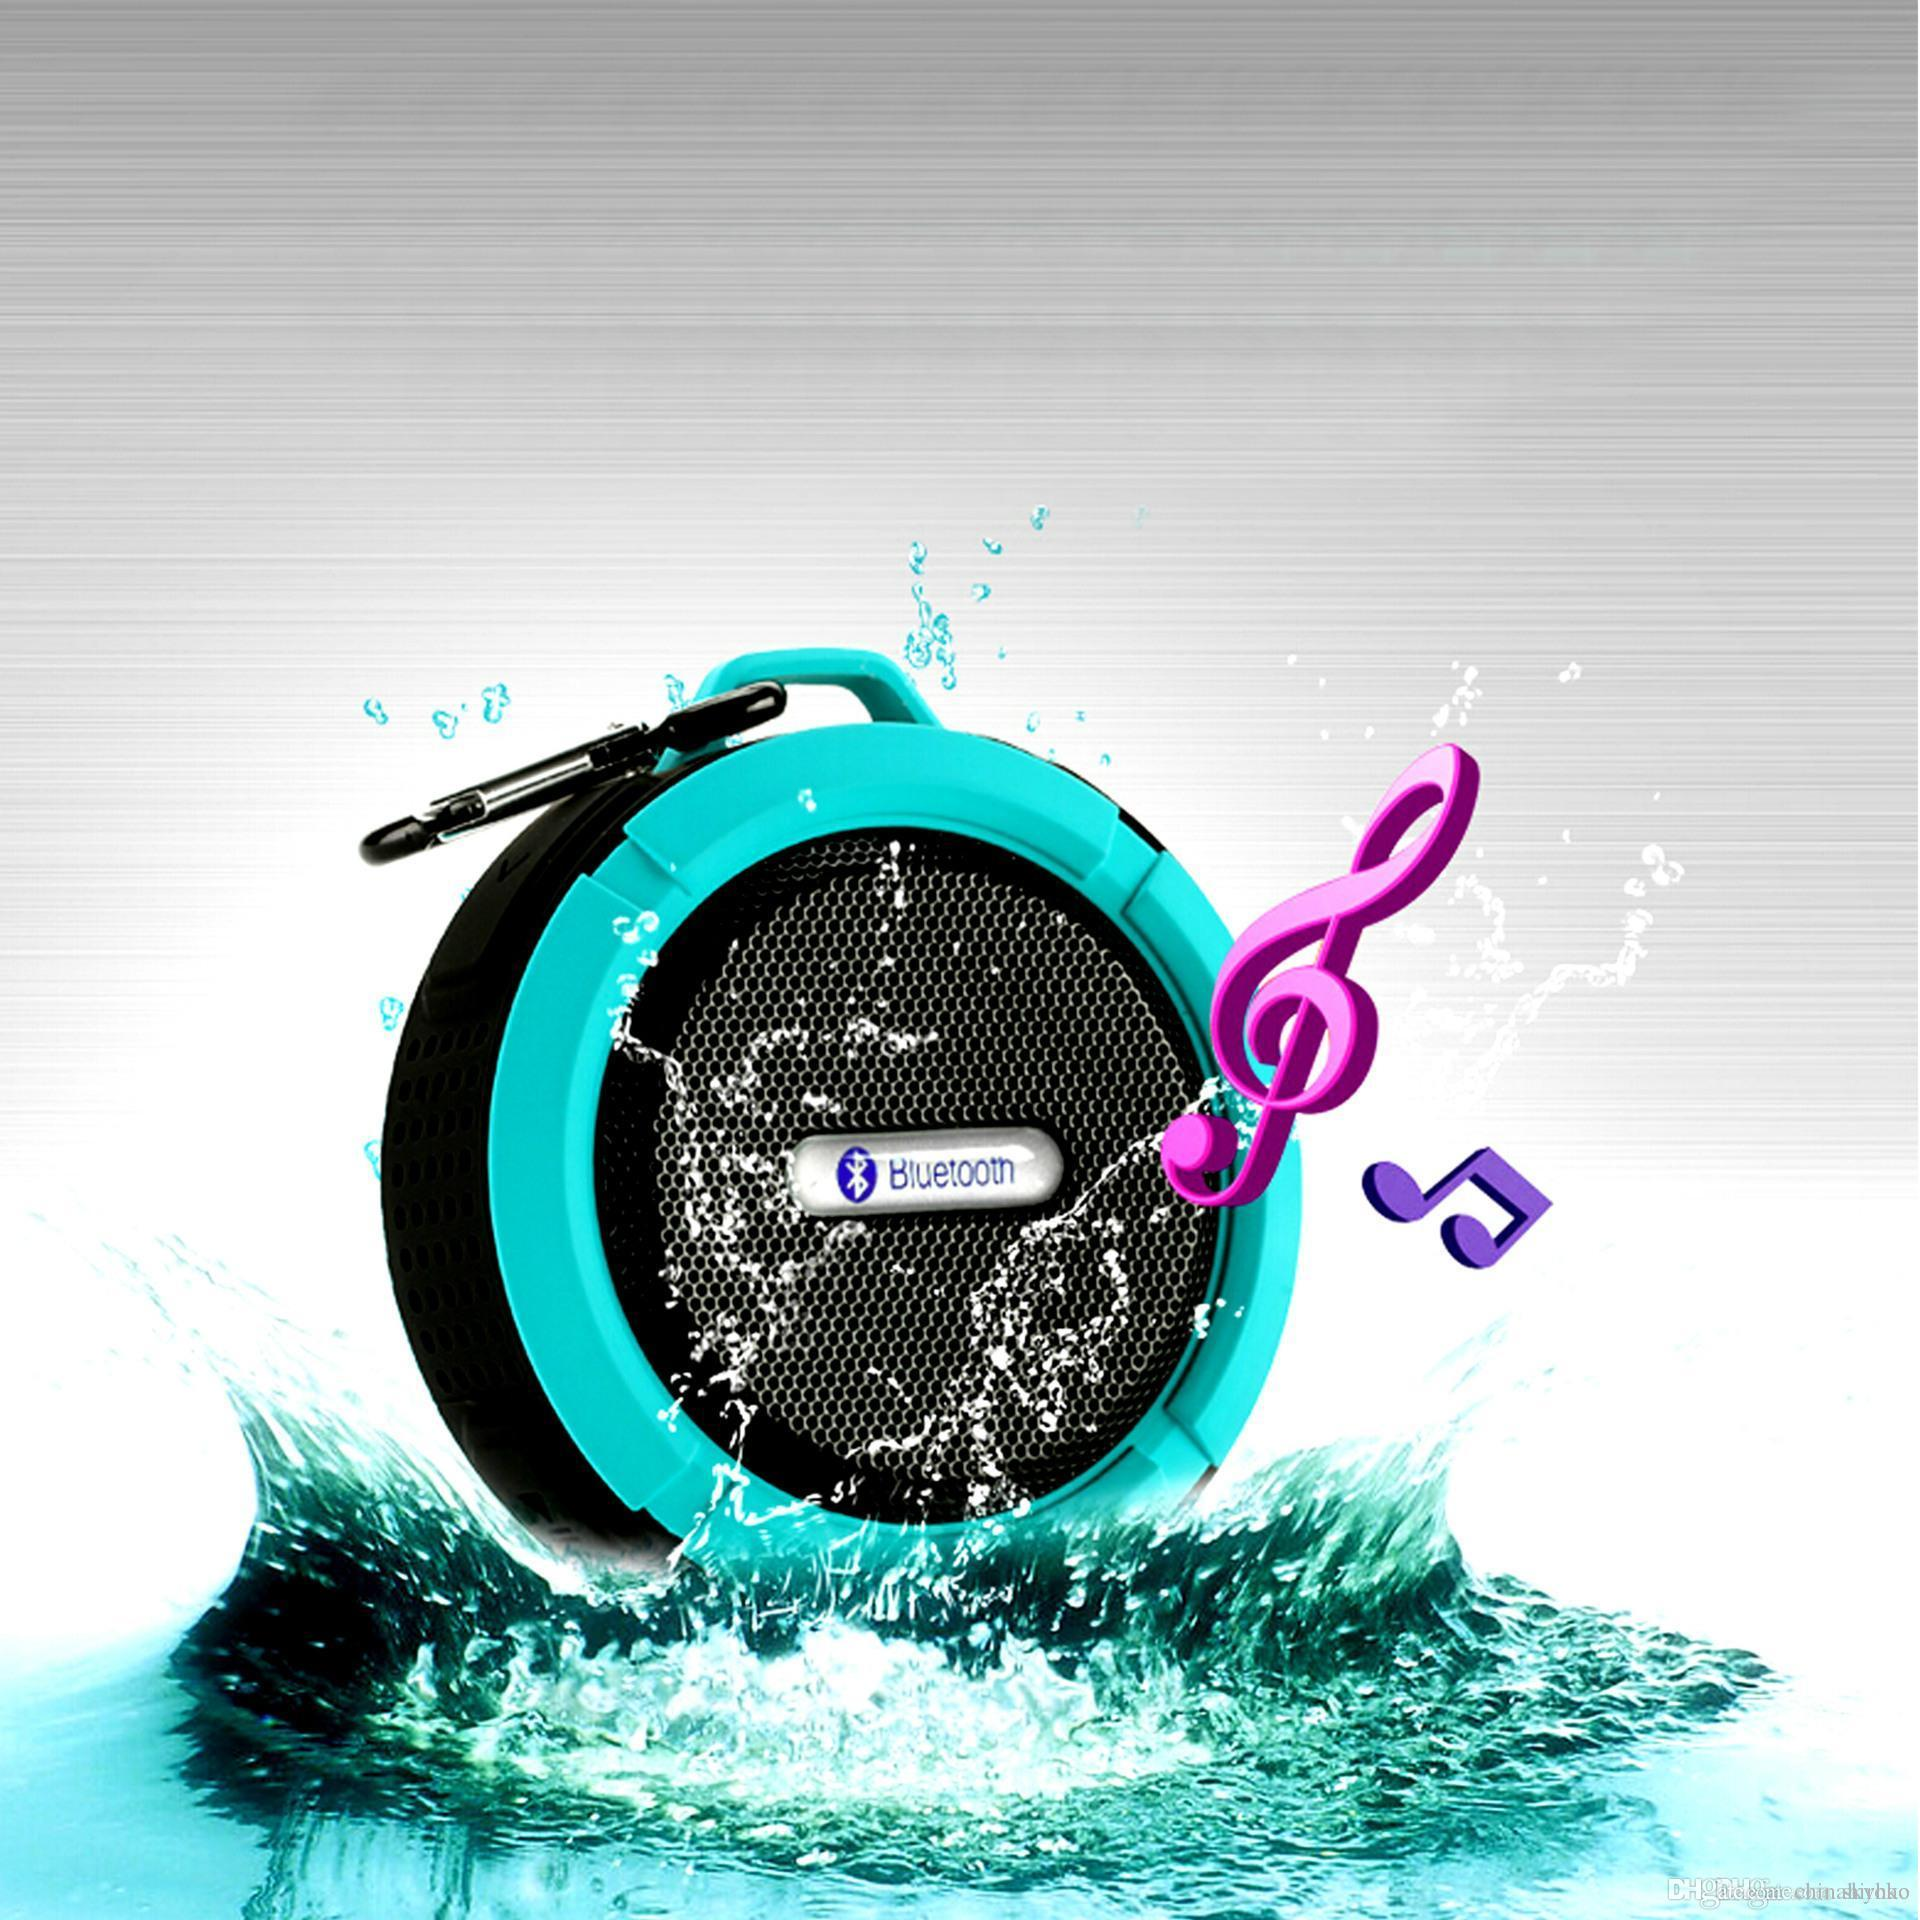 Waterproof Speaker C6 Bluetooth Mini Sound Box Hook Suction Cup Wireless Microphone Hands-free sprot speakers Free DHL Fedex